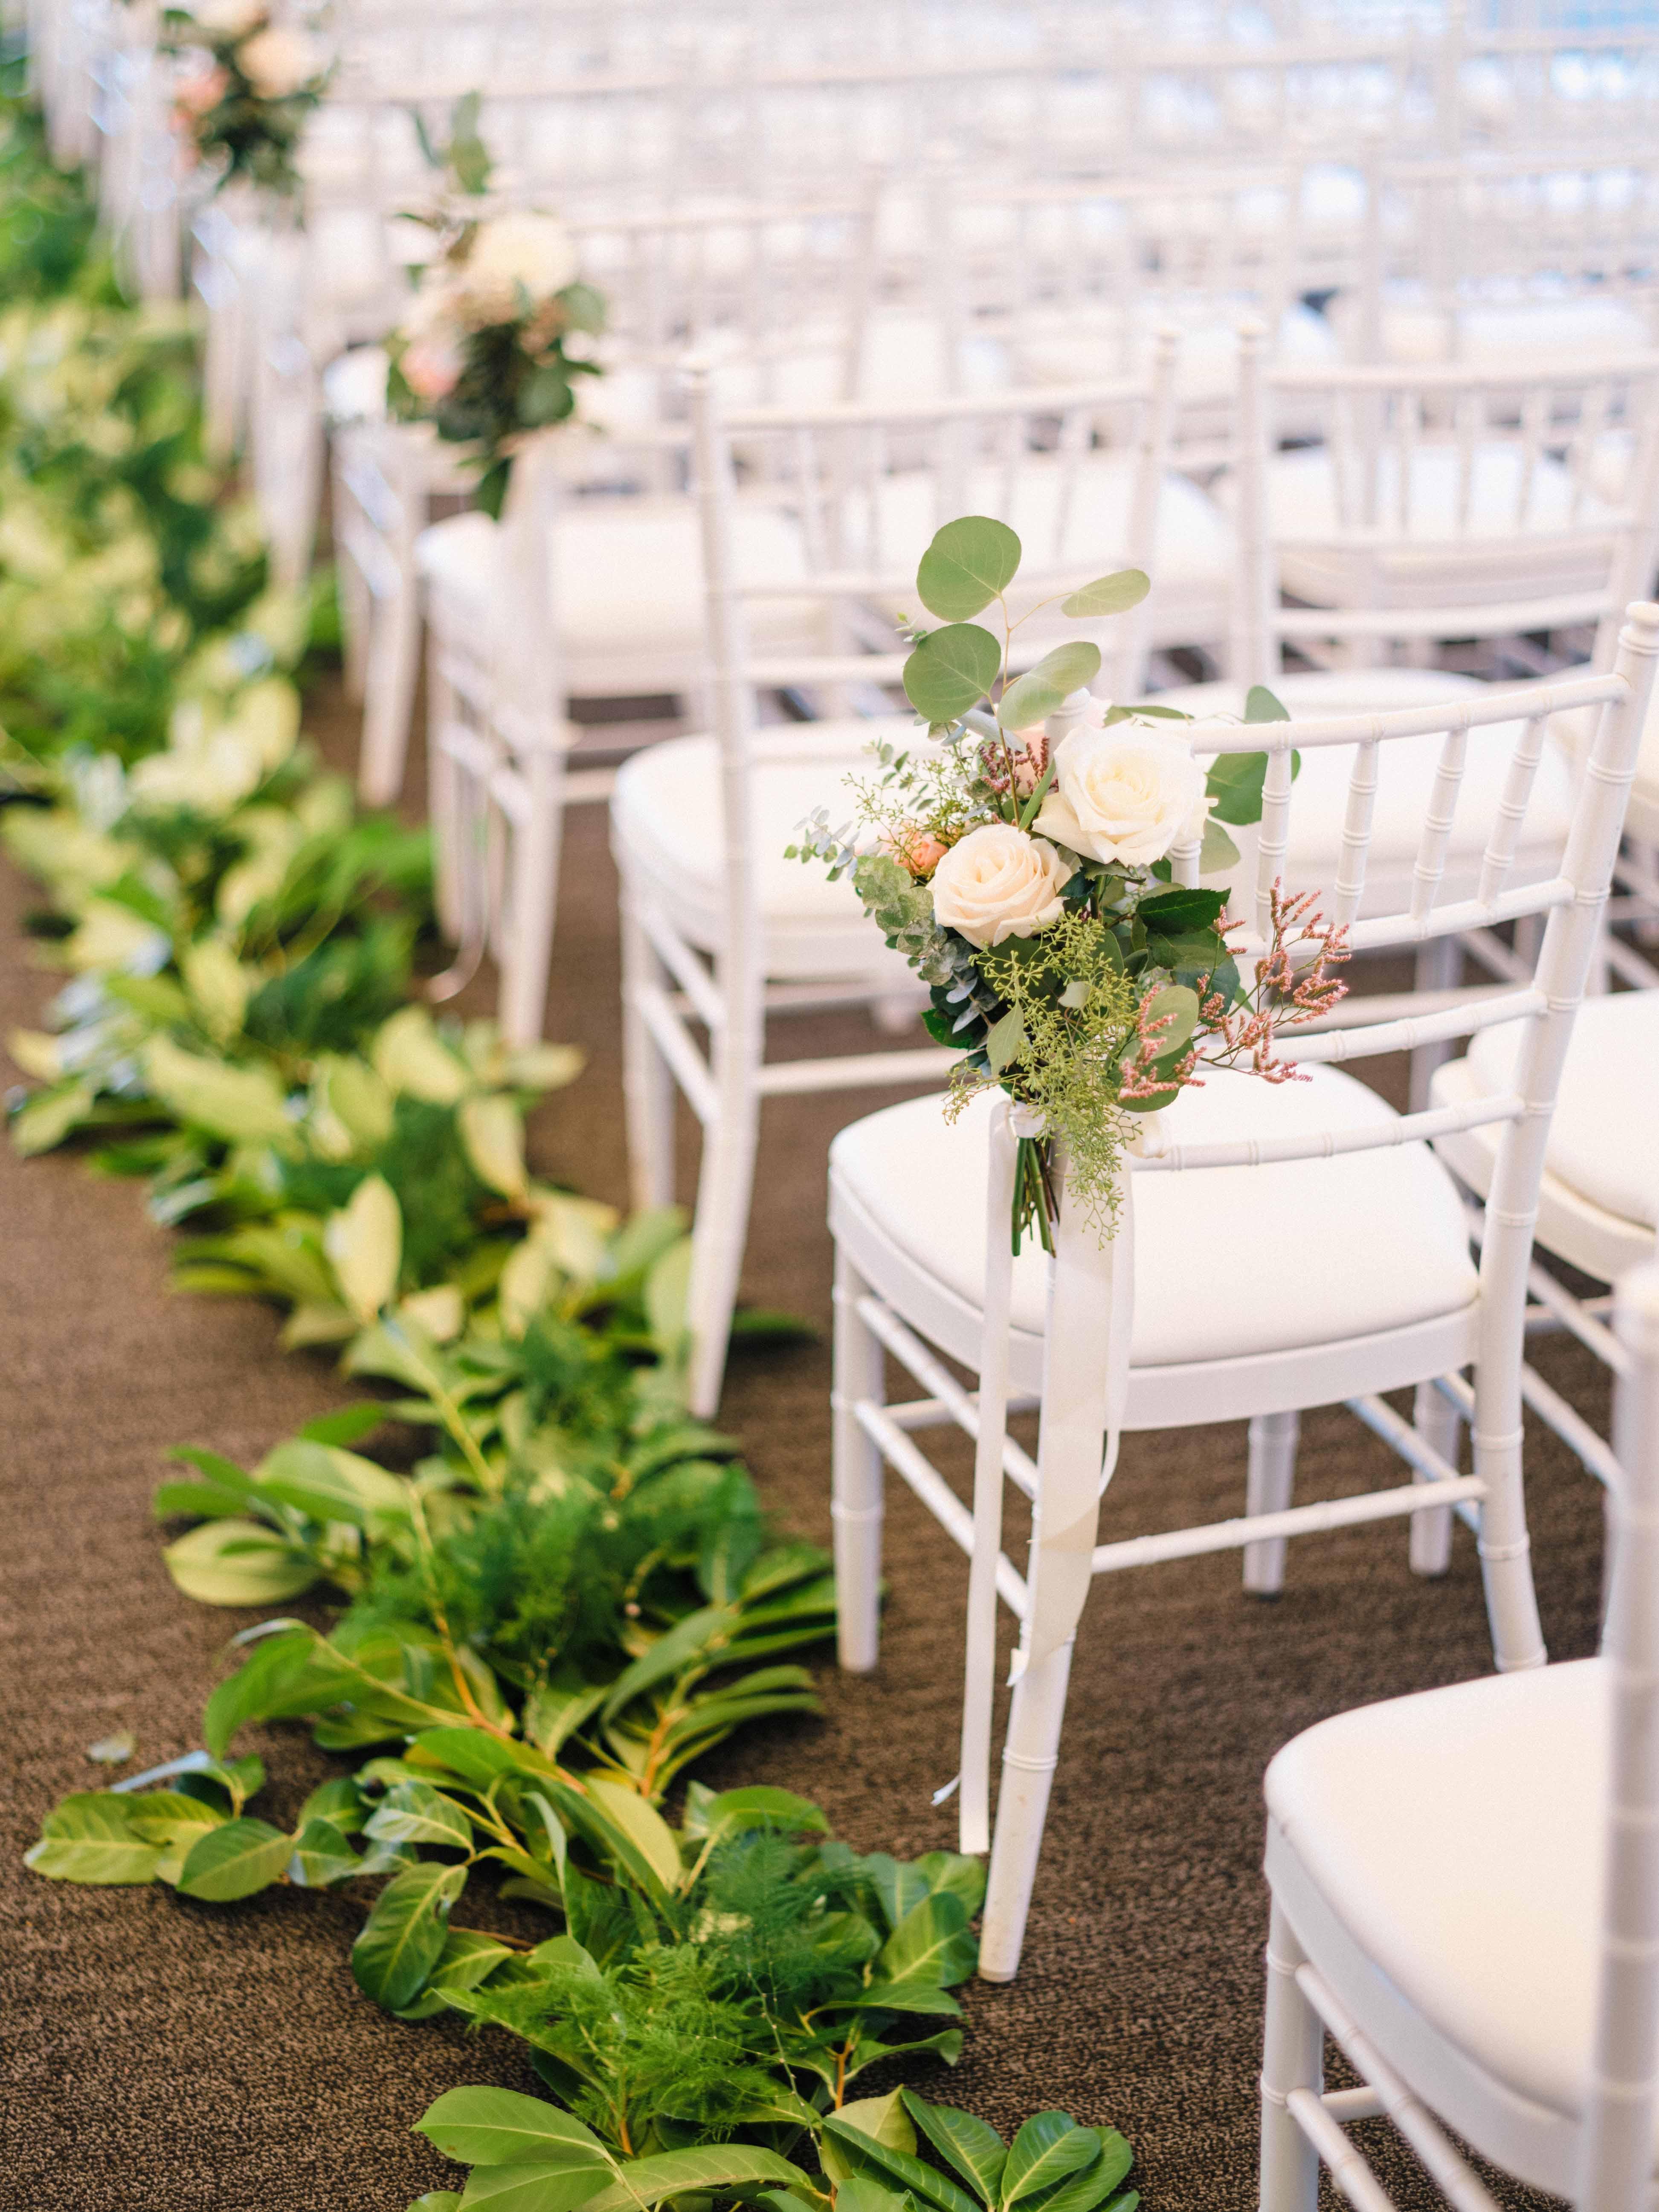 Greenery garlands lining a wedding ceremony aisle - Woodmark Hotel Wedding by Flora Nova Design Seattle